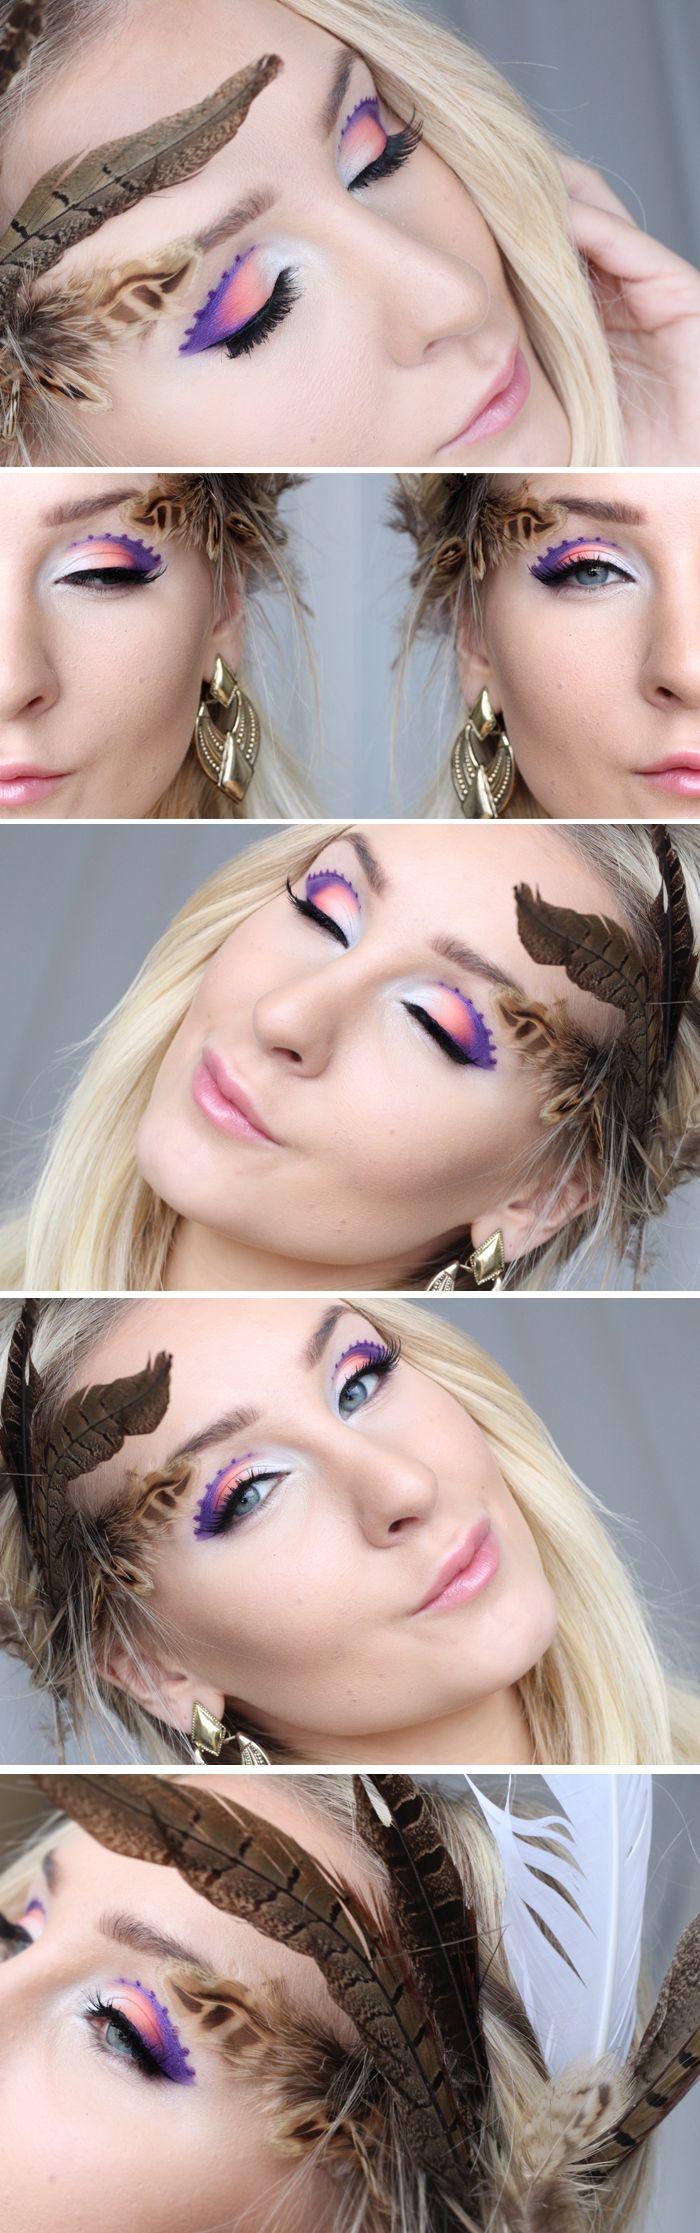 Dagens makeup – futuristic purple | Helen Torsgården – Hiilens sminkblogg